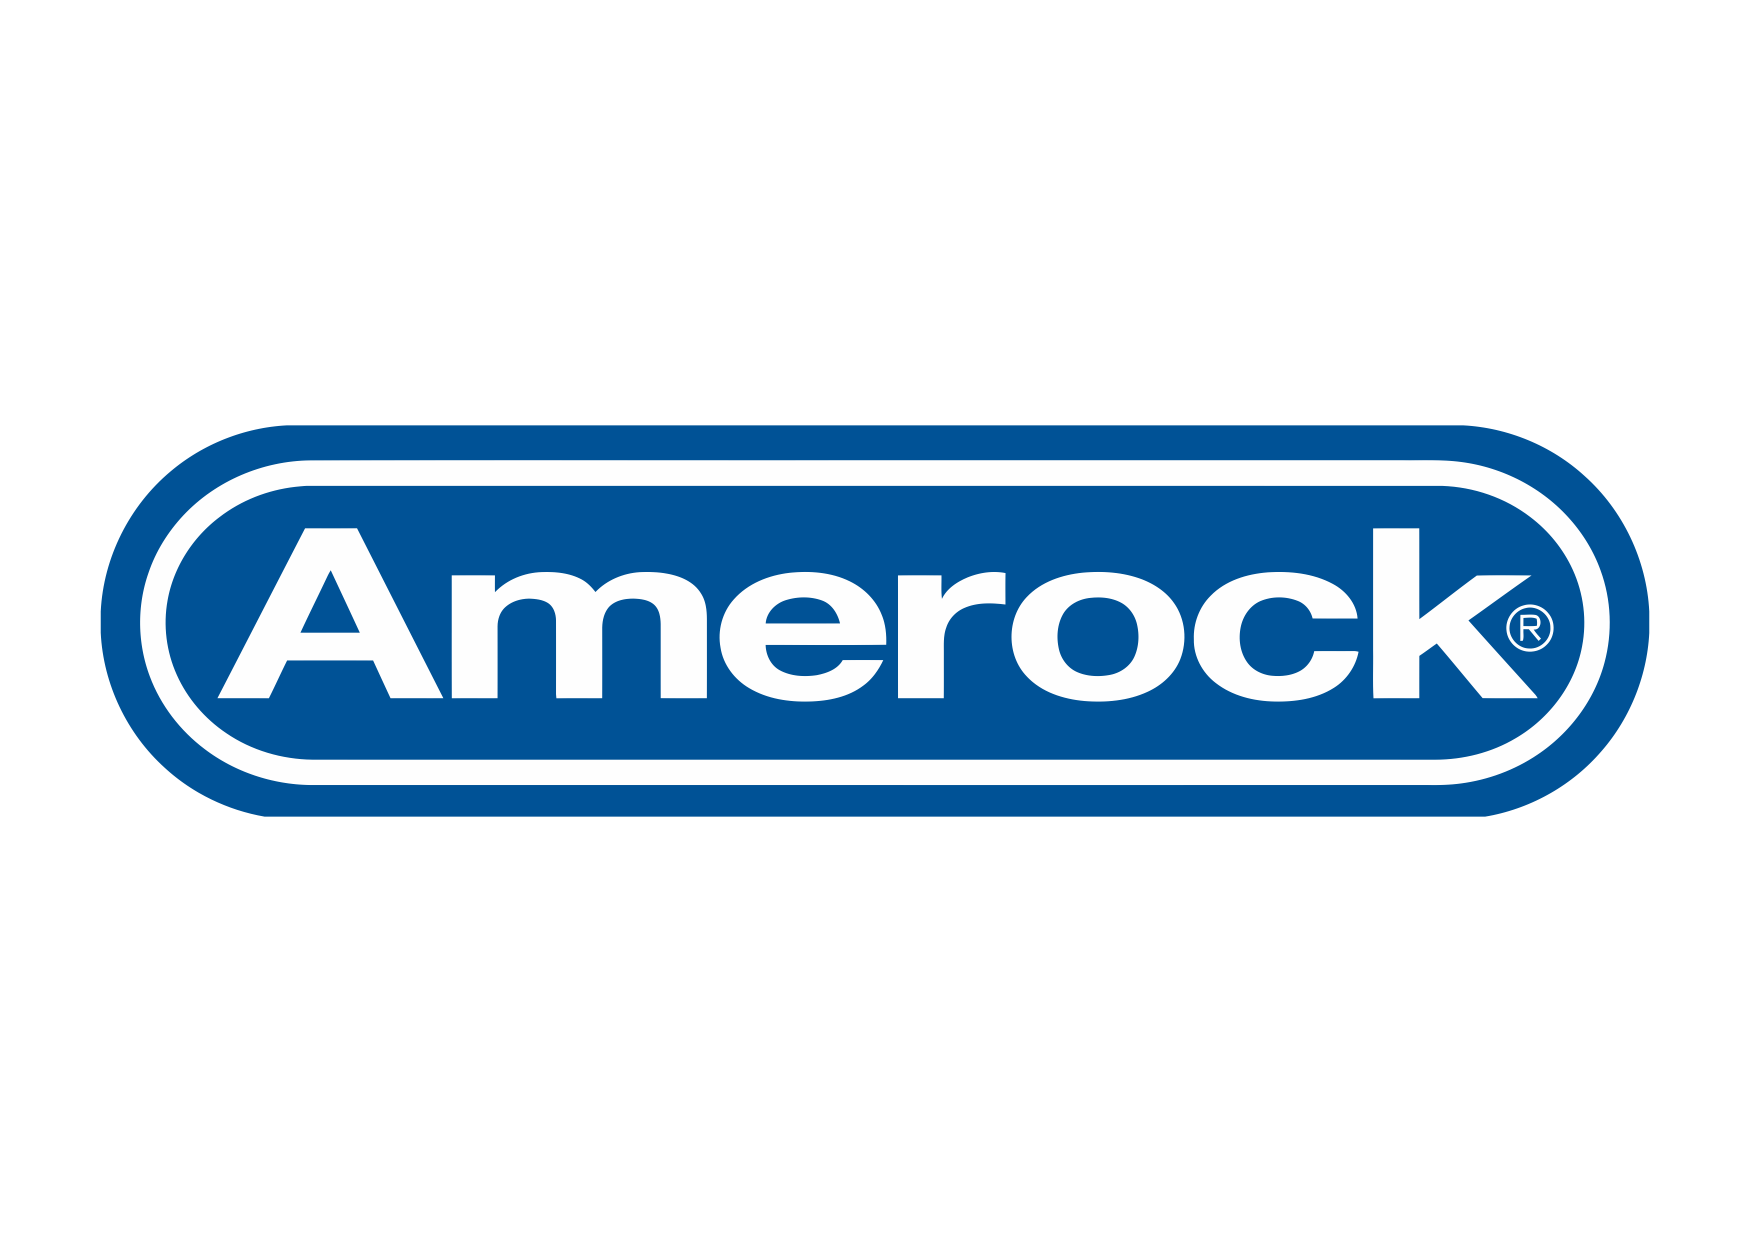 Amerock vector logo.png